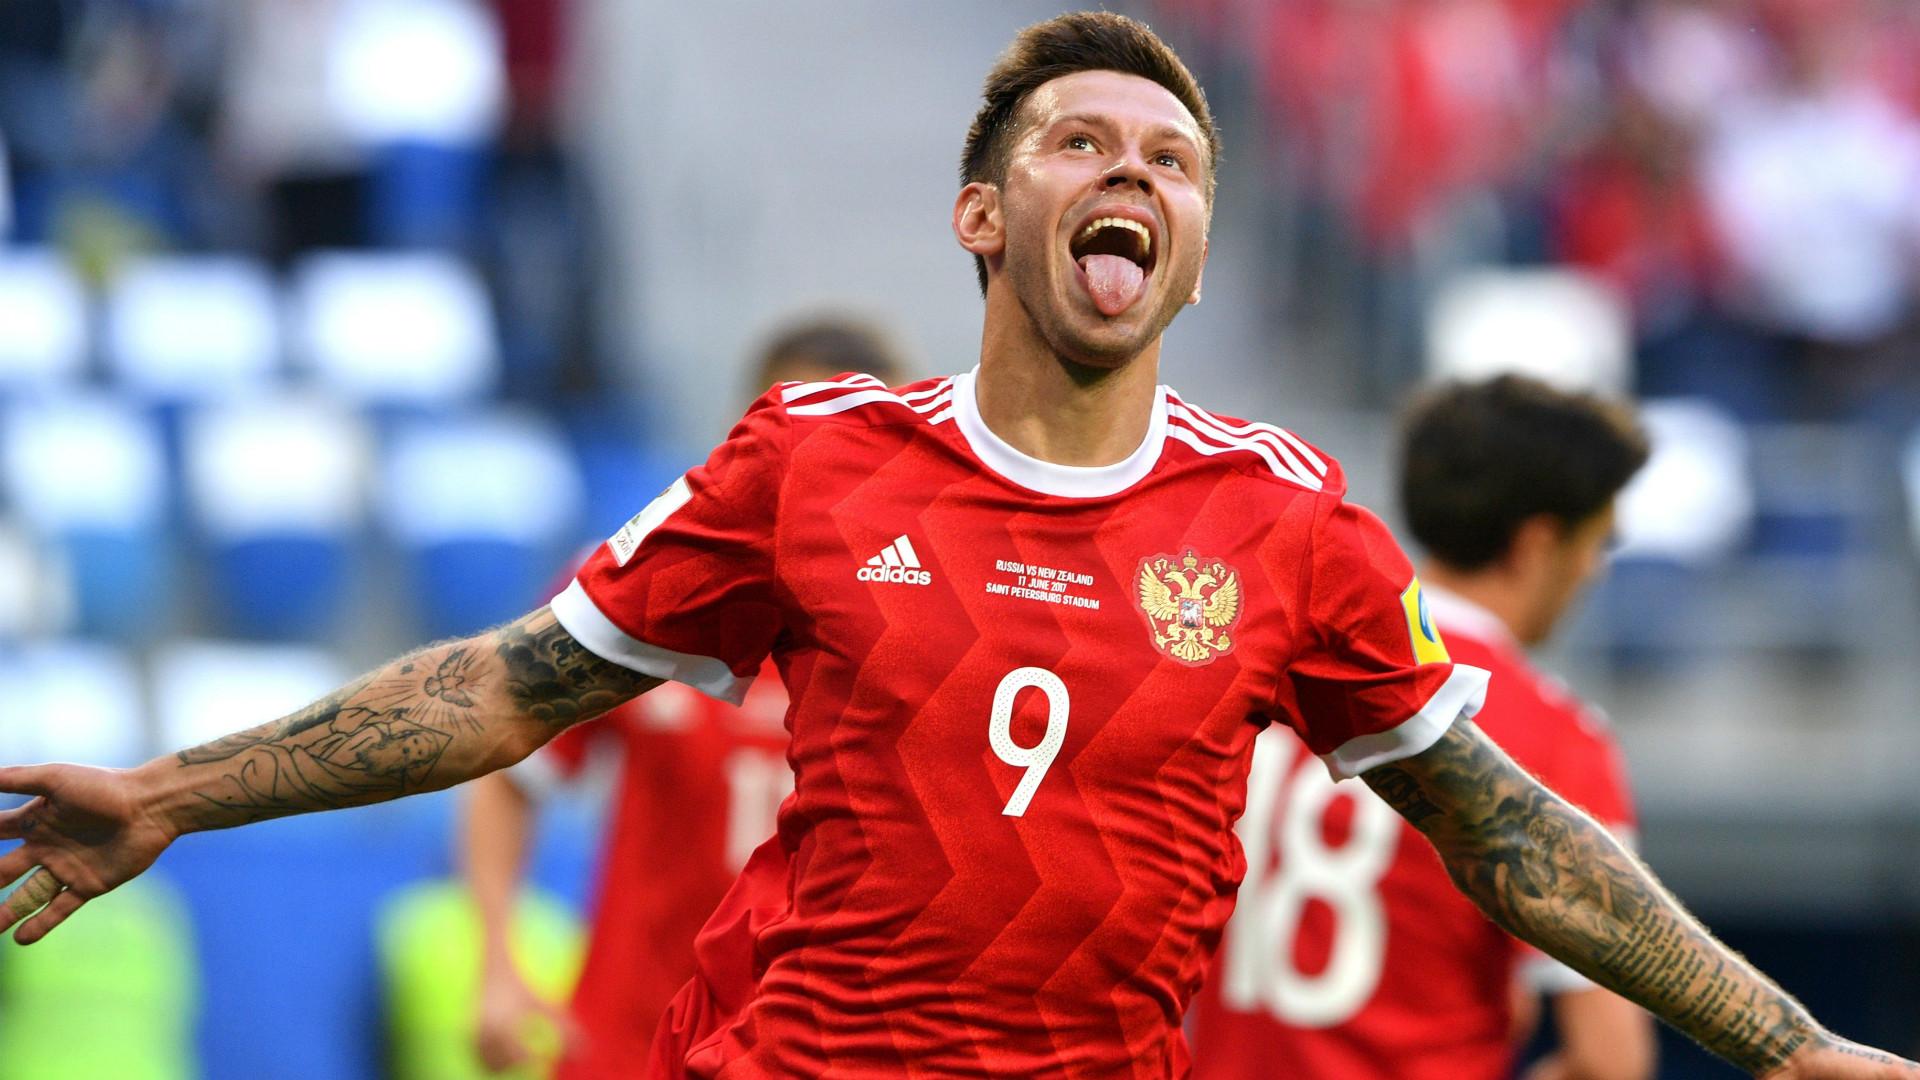 russia-confederations-cup_1ynlw8jrbd7u13bideaj4i6na